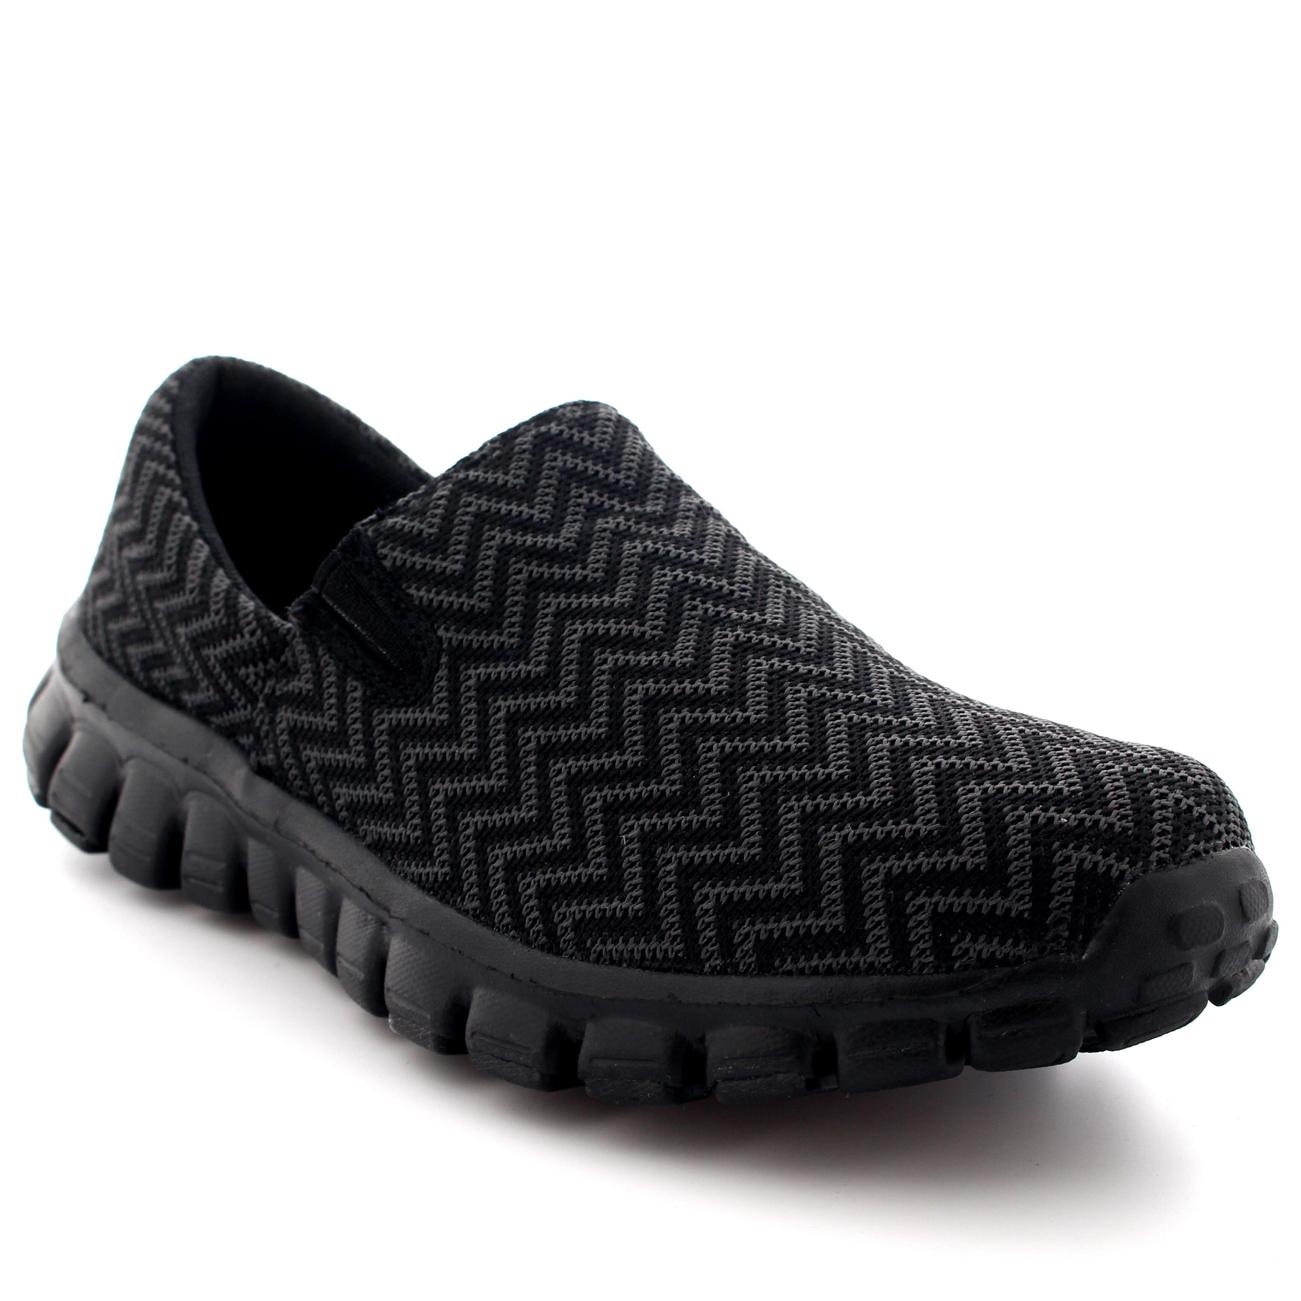 Womens Jogging Walking Gym Shoes Sports Work Running Slip On Sneakers US 5-11